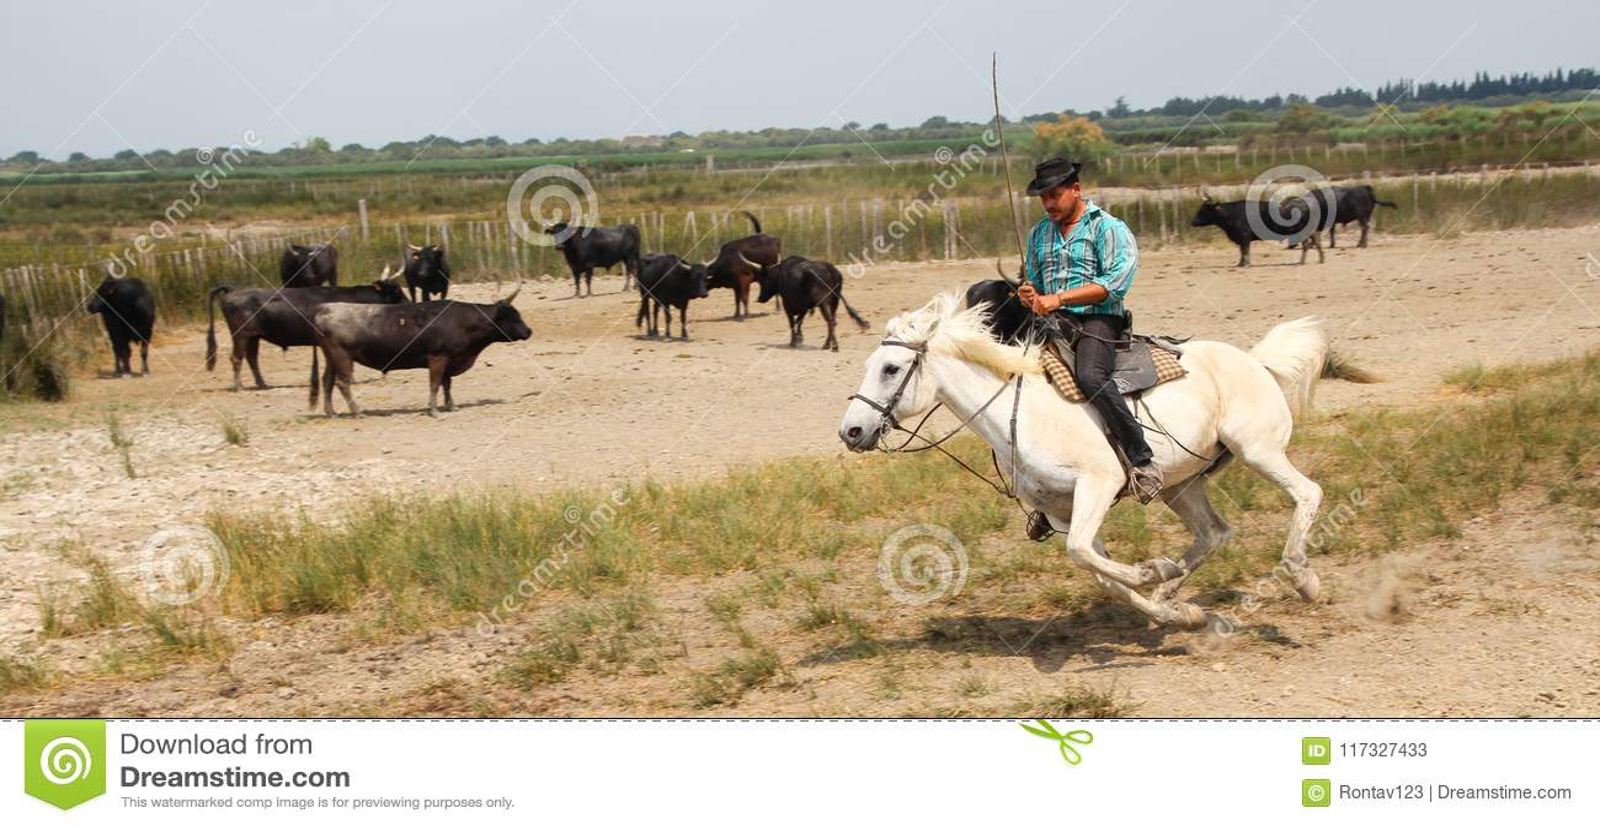 Camargue Cowboy is riding on beautiful white horse herding black bulls